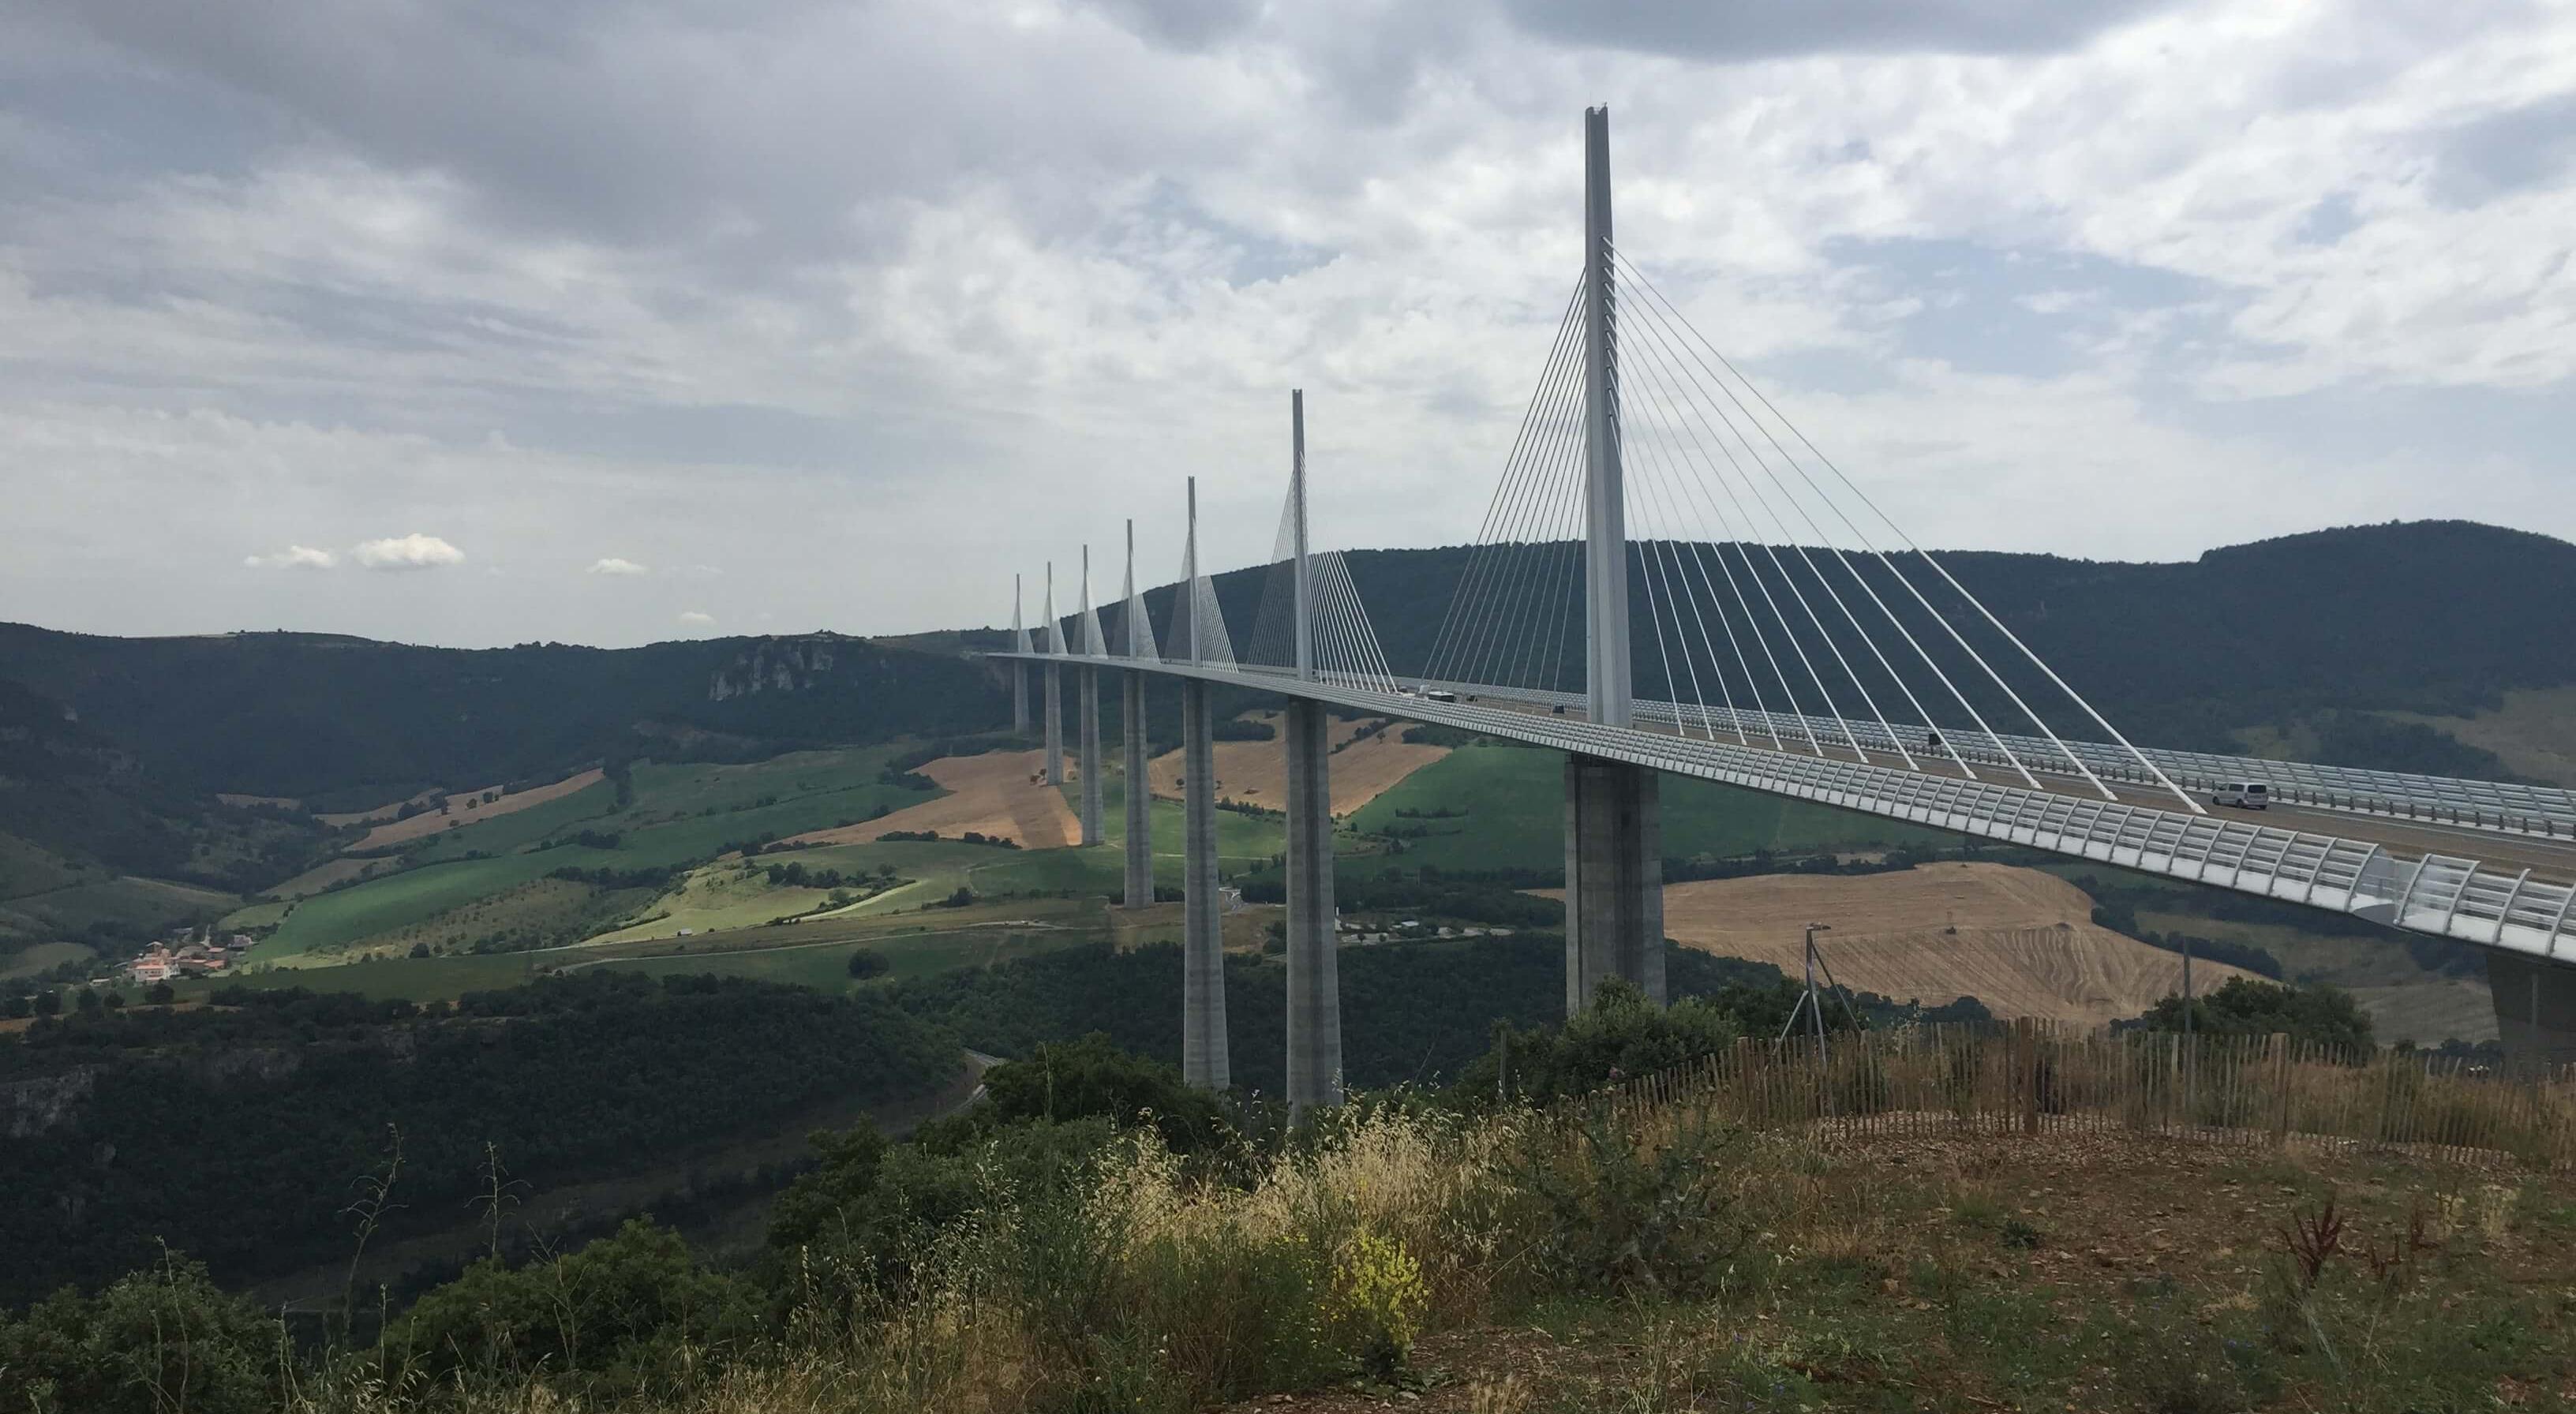 Le Viaduc de Millau near Millau, France